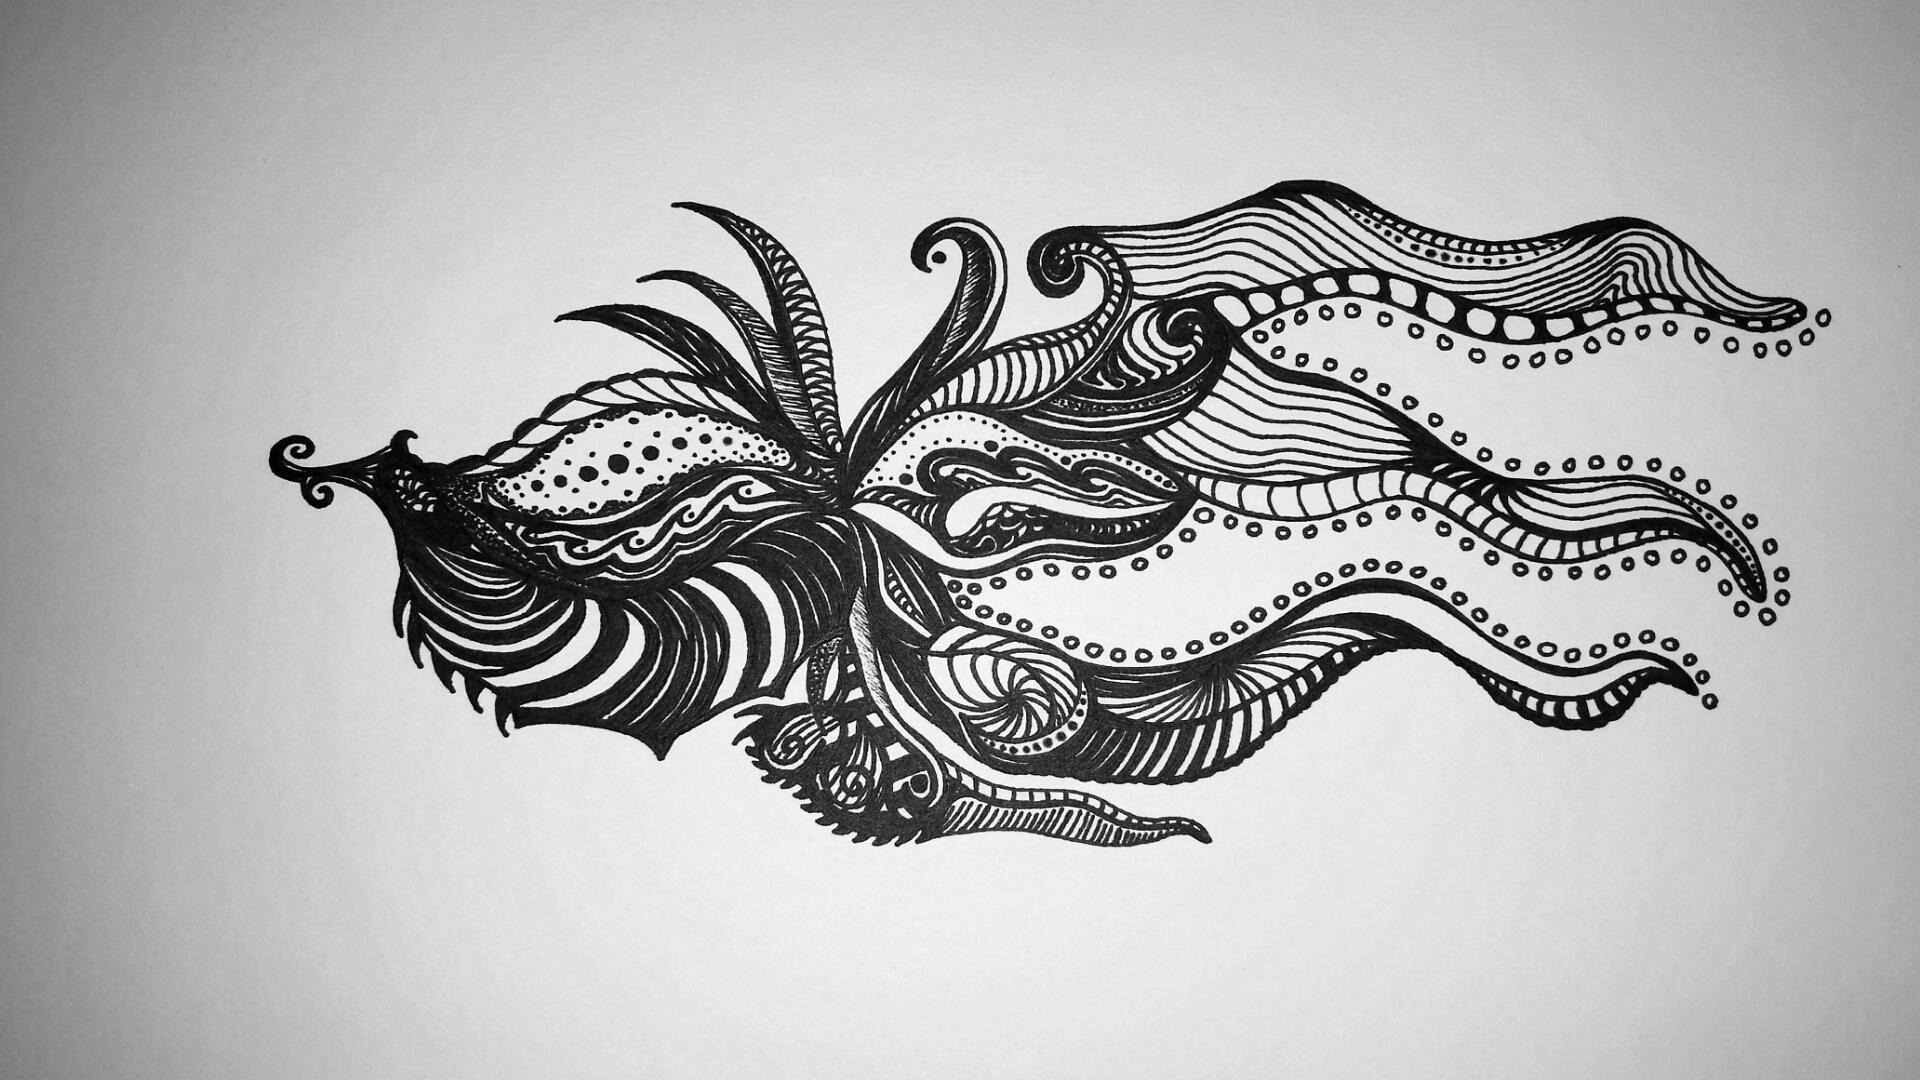 Octopus Lookin Thing sharpie 7x10 http://ift.tt/2DTQ6IZ